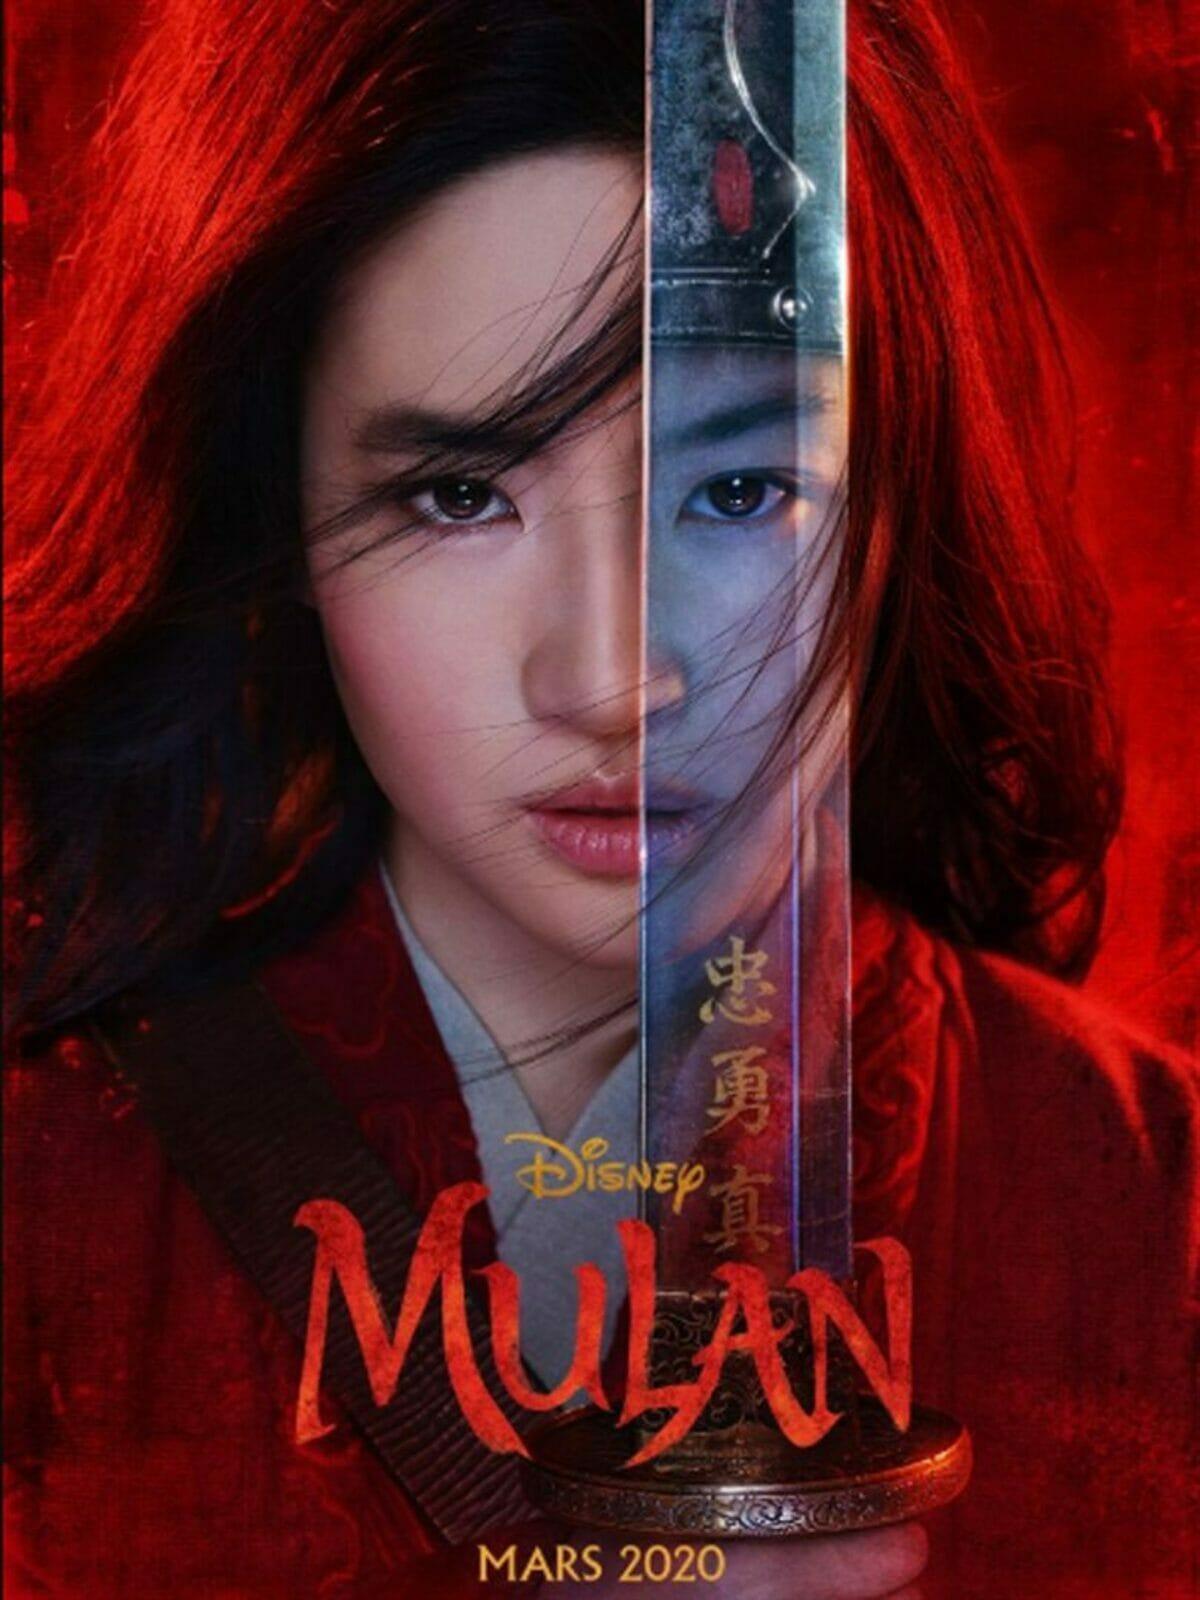 Mulan-poster-teaser